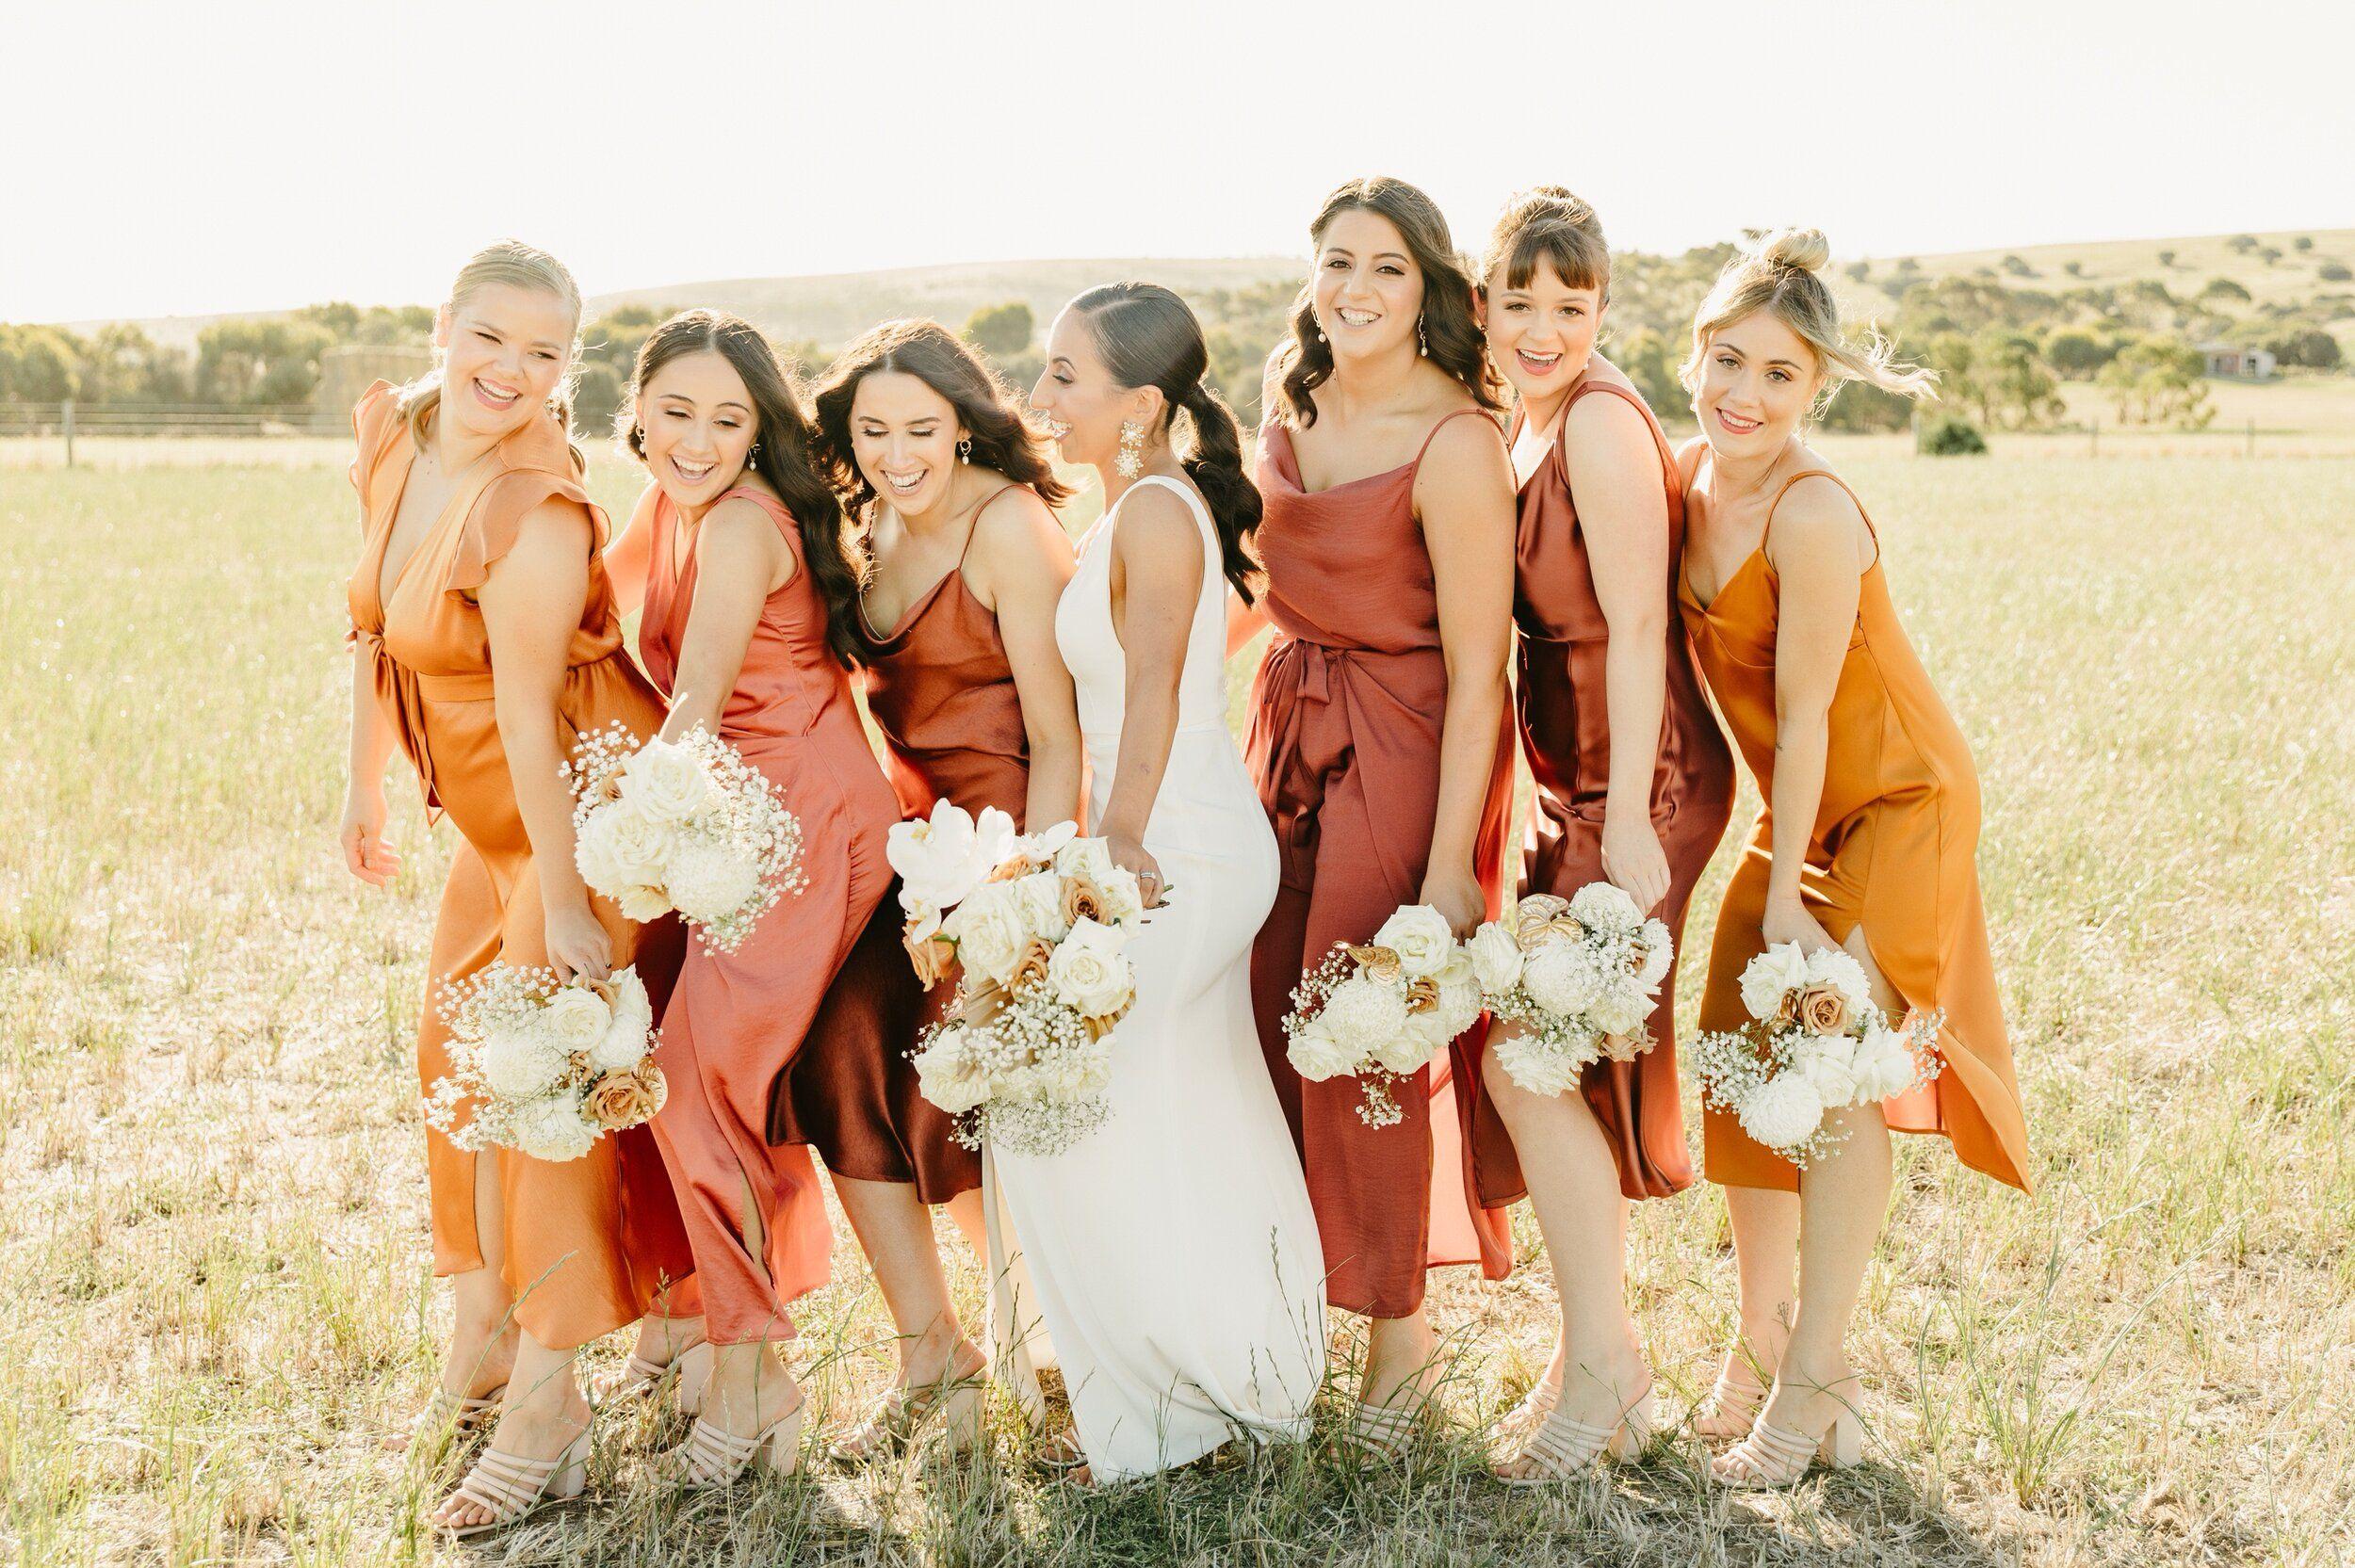 Sophia Michael S Bright Tuscan Vibe Wedding At Waverley Estate Emma Fai Orange Bridesmaid Dresses Burnt Orange Bridesmaid Dresses Summer Bridesmaid Dresses [ 1665 x 2500 Pixel ]